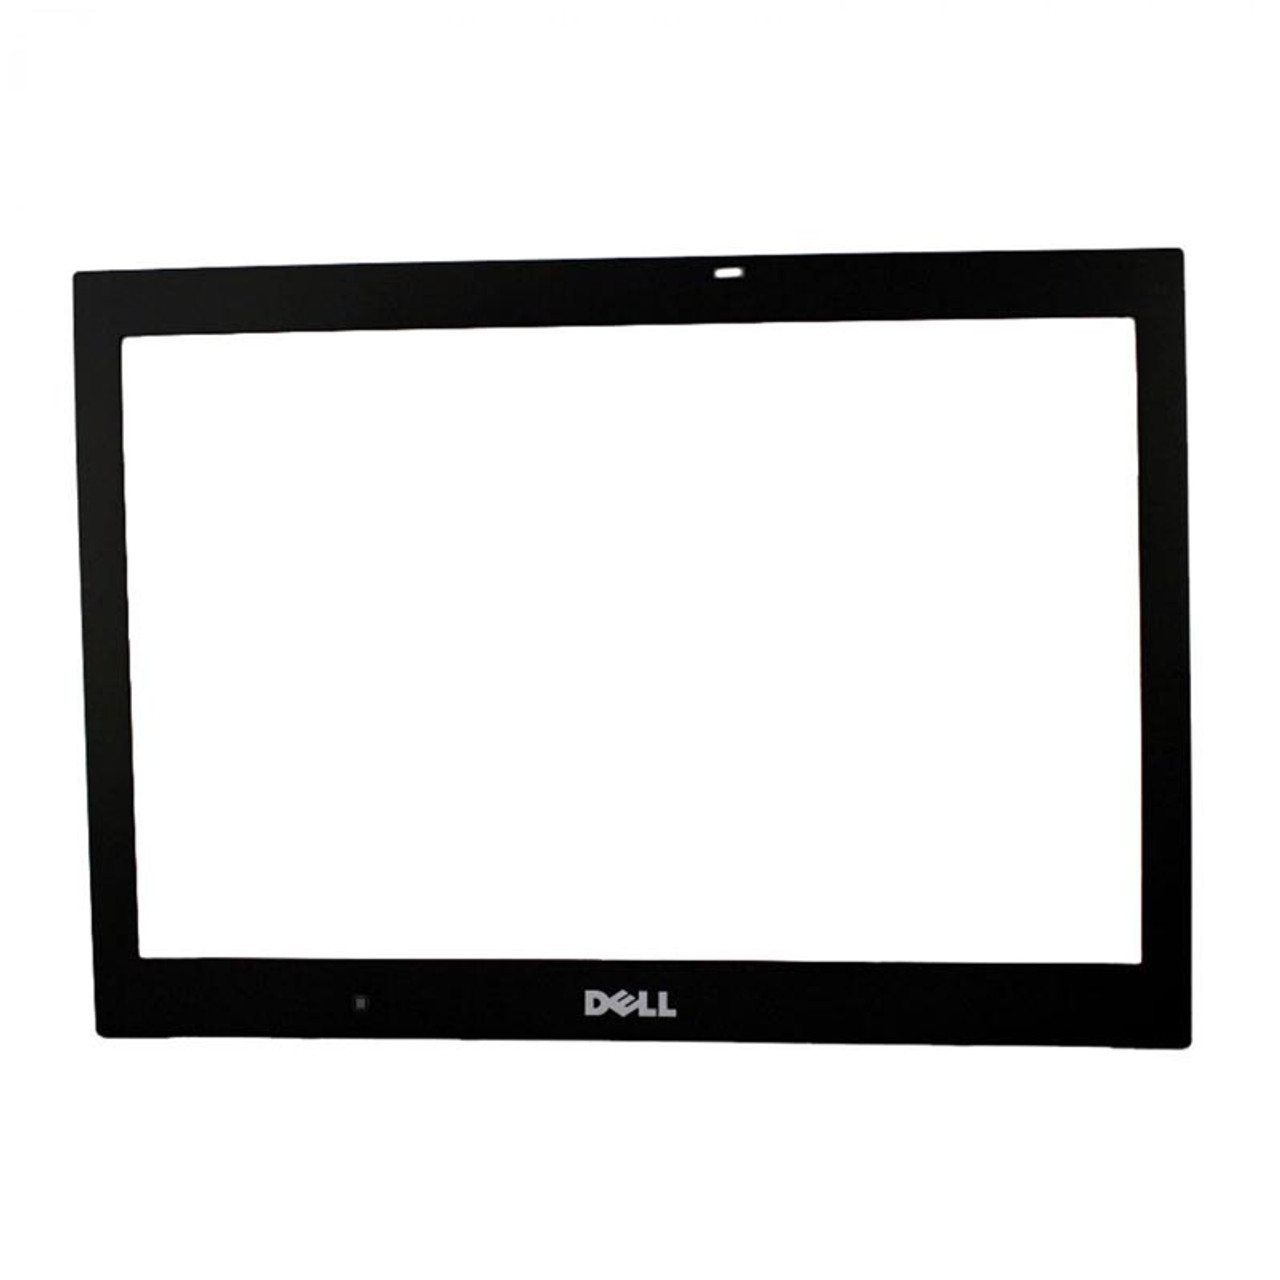 Dell Inspiron 5545 5547 5548 Screen Bezel with Webcam Port  984XG 0984XG